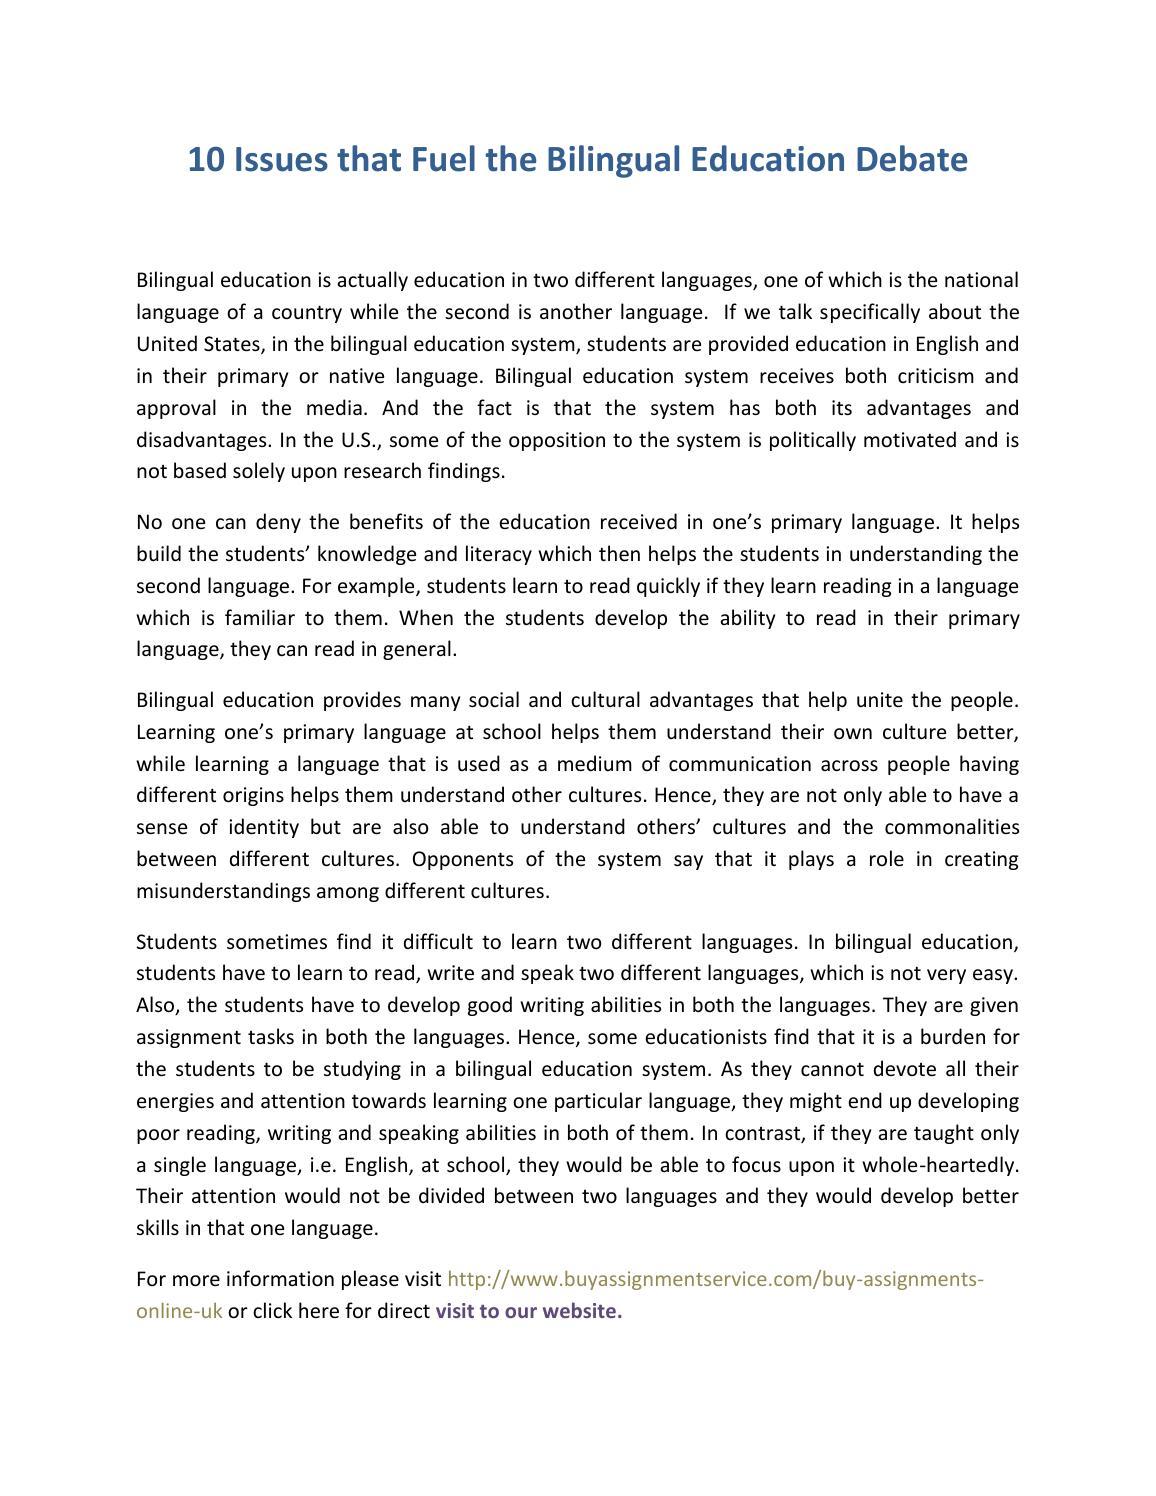 bilingual education 2 essay College papers college papers (paper 224) on bilingual education: brandy bruckert kim gunter rhetoric 105 25 november 1997 bilingual education: structurally ineffective bilingual education for language mino.